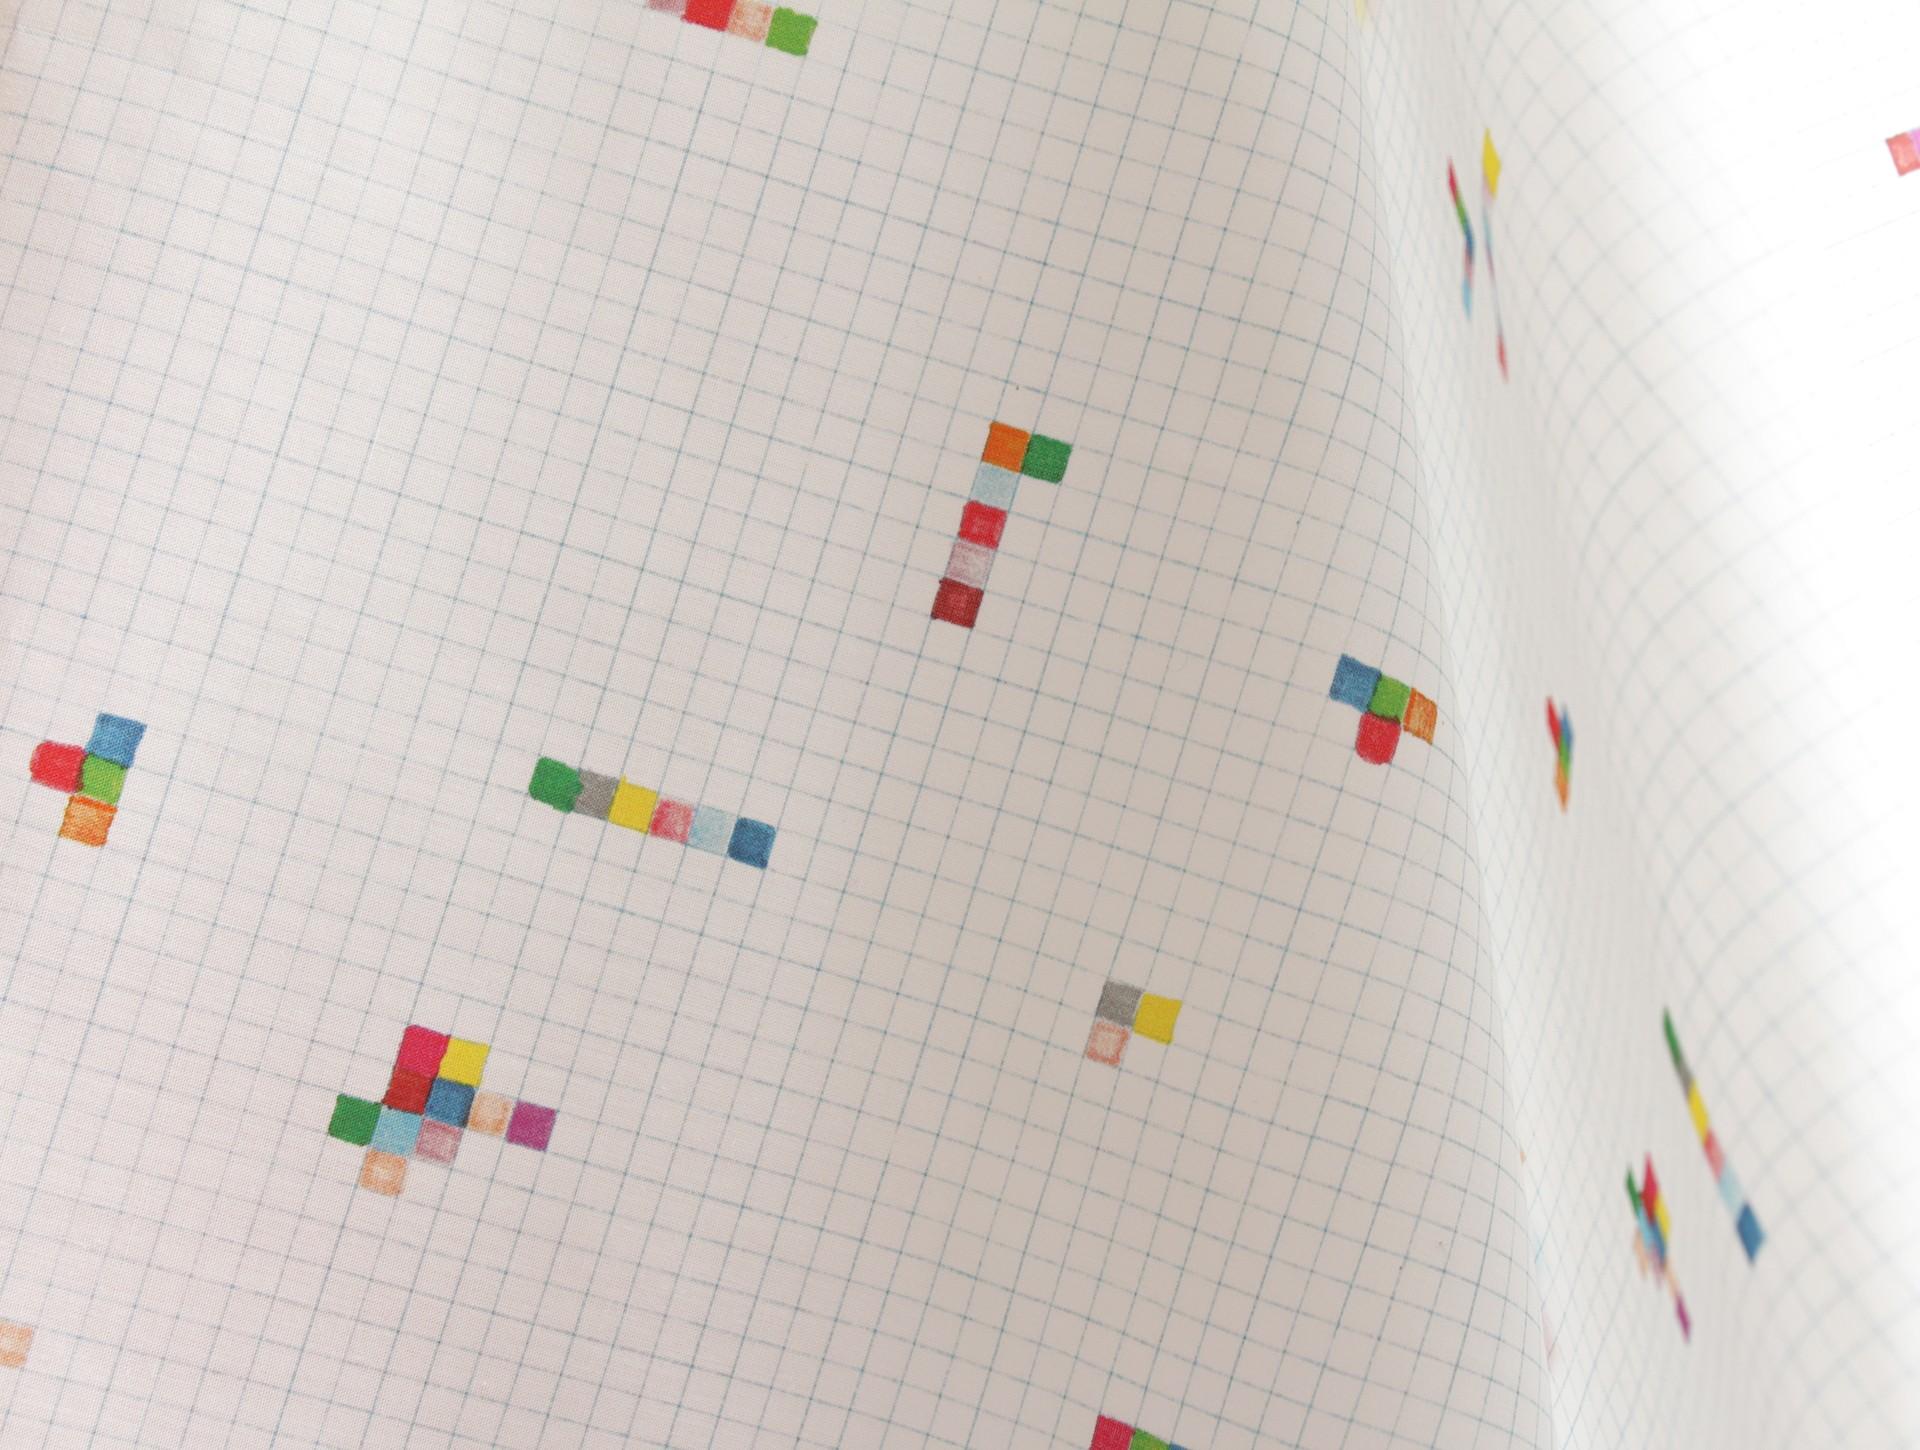 Speciale editie stof 'hokjes' 0,5 meter